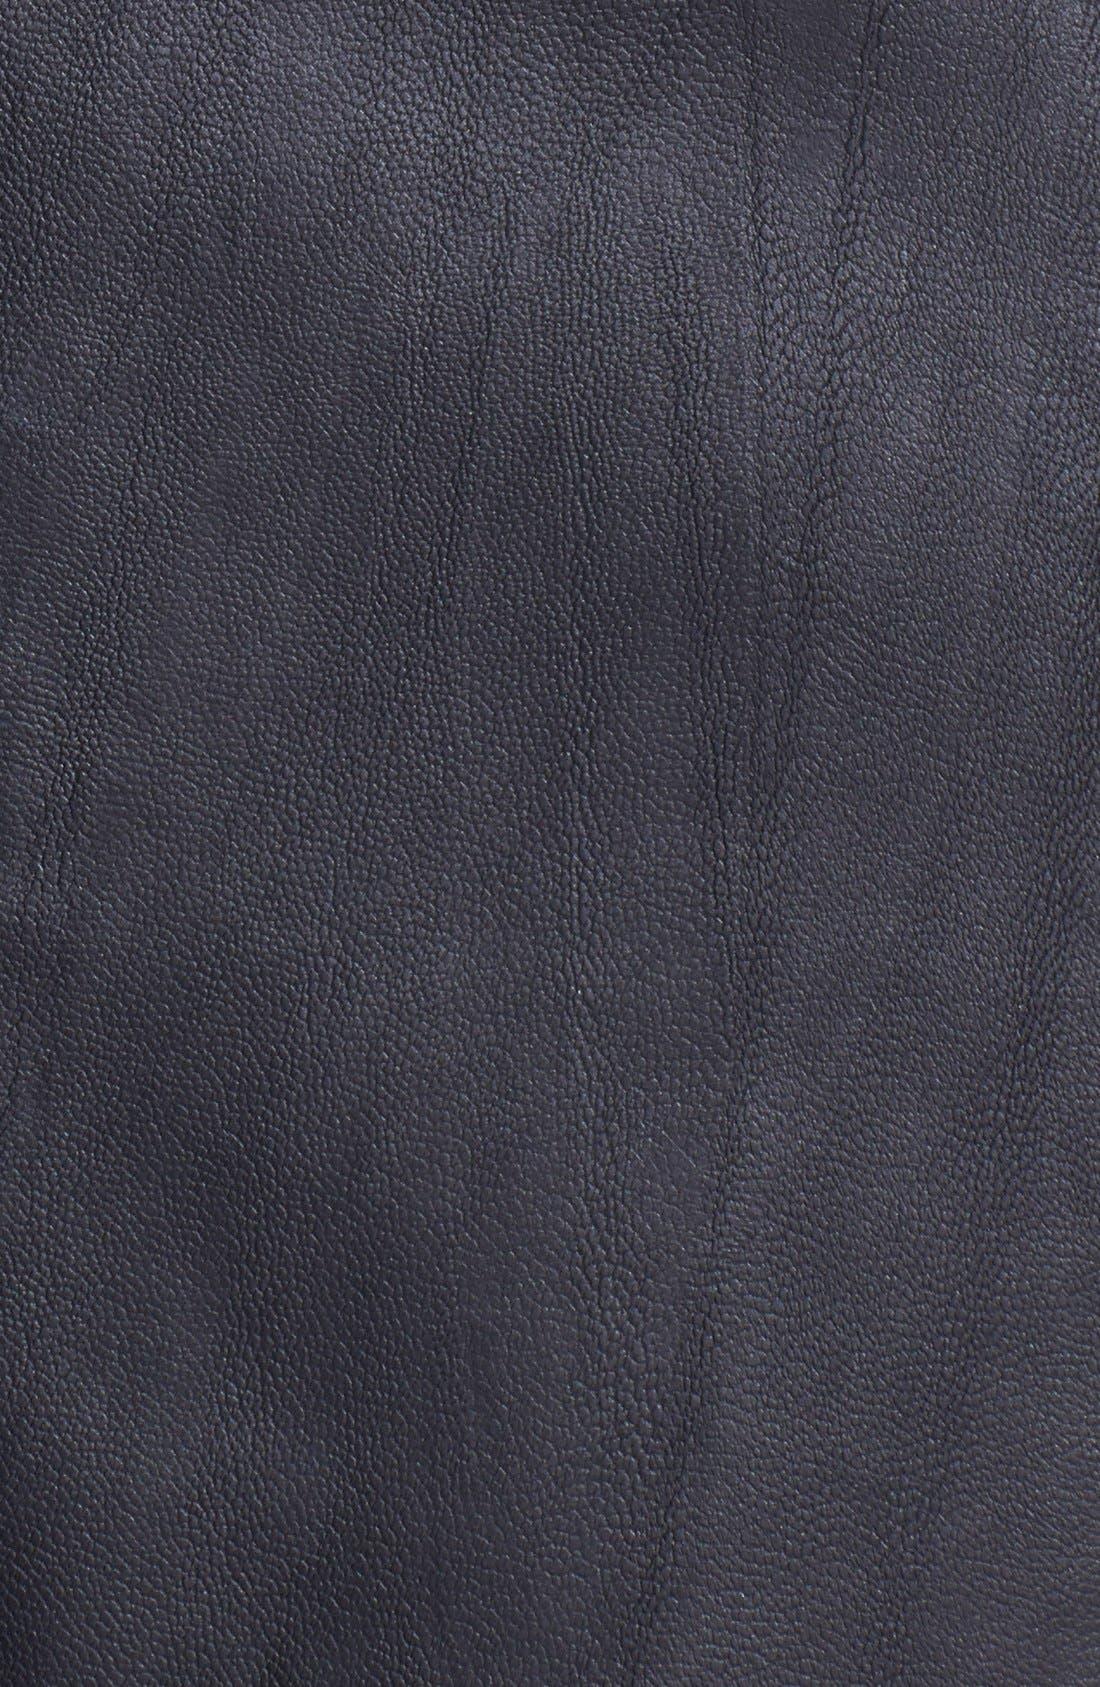 ASTR THE LABEL, ASTR Faux Leather Midi Skirt, Alternate thumbnail 2, color, 001